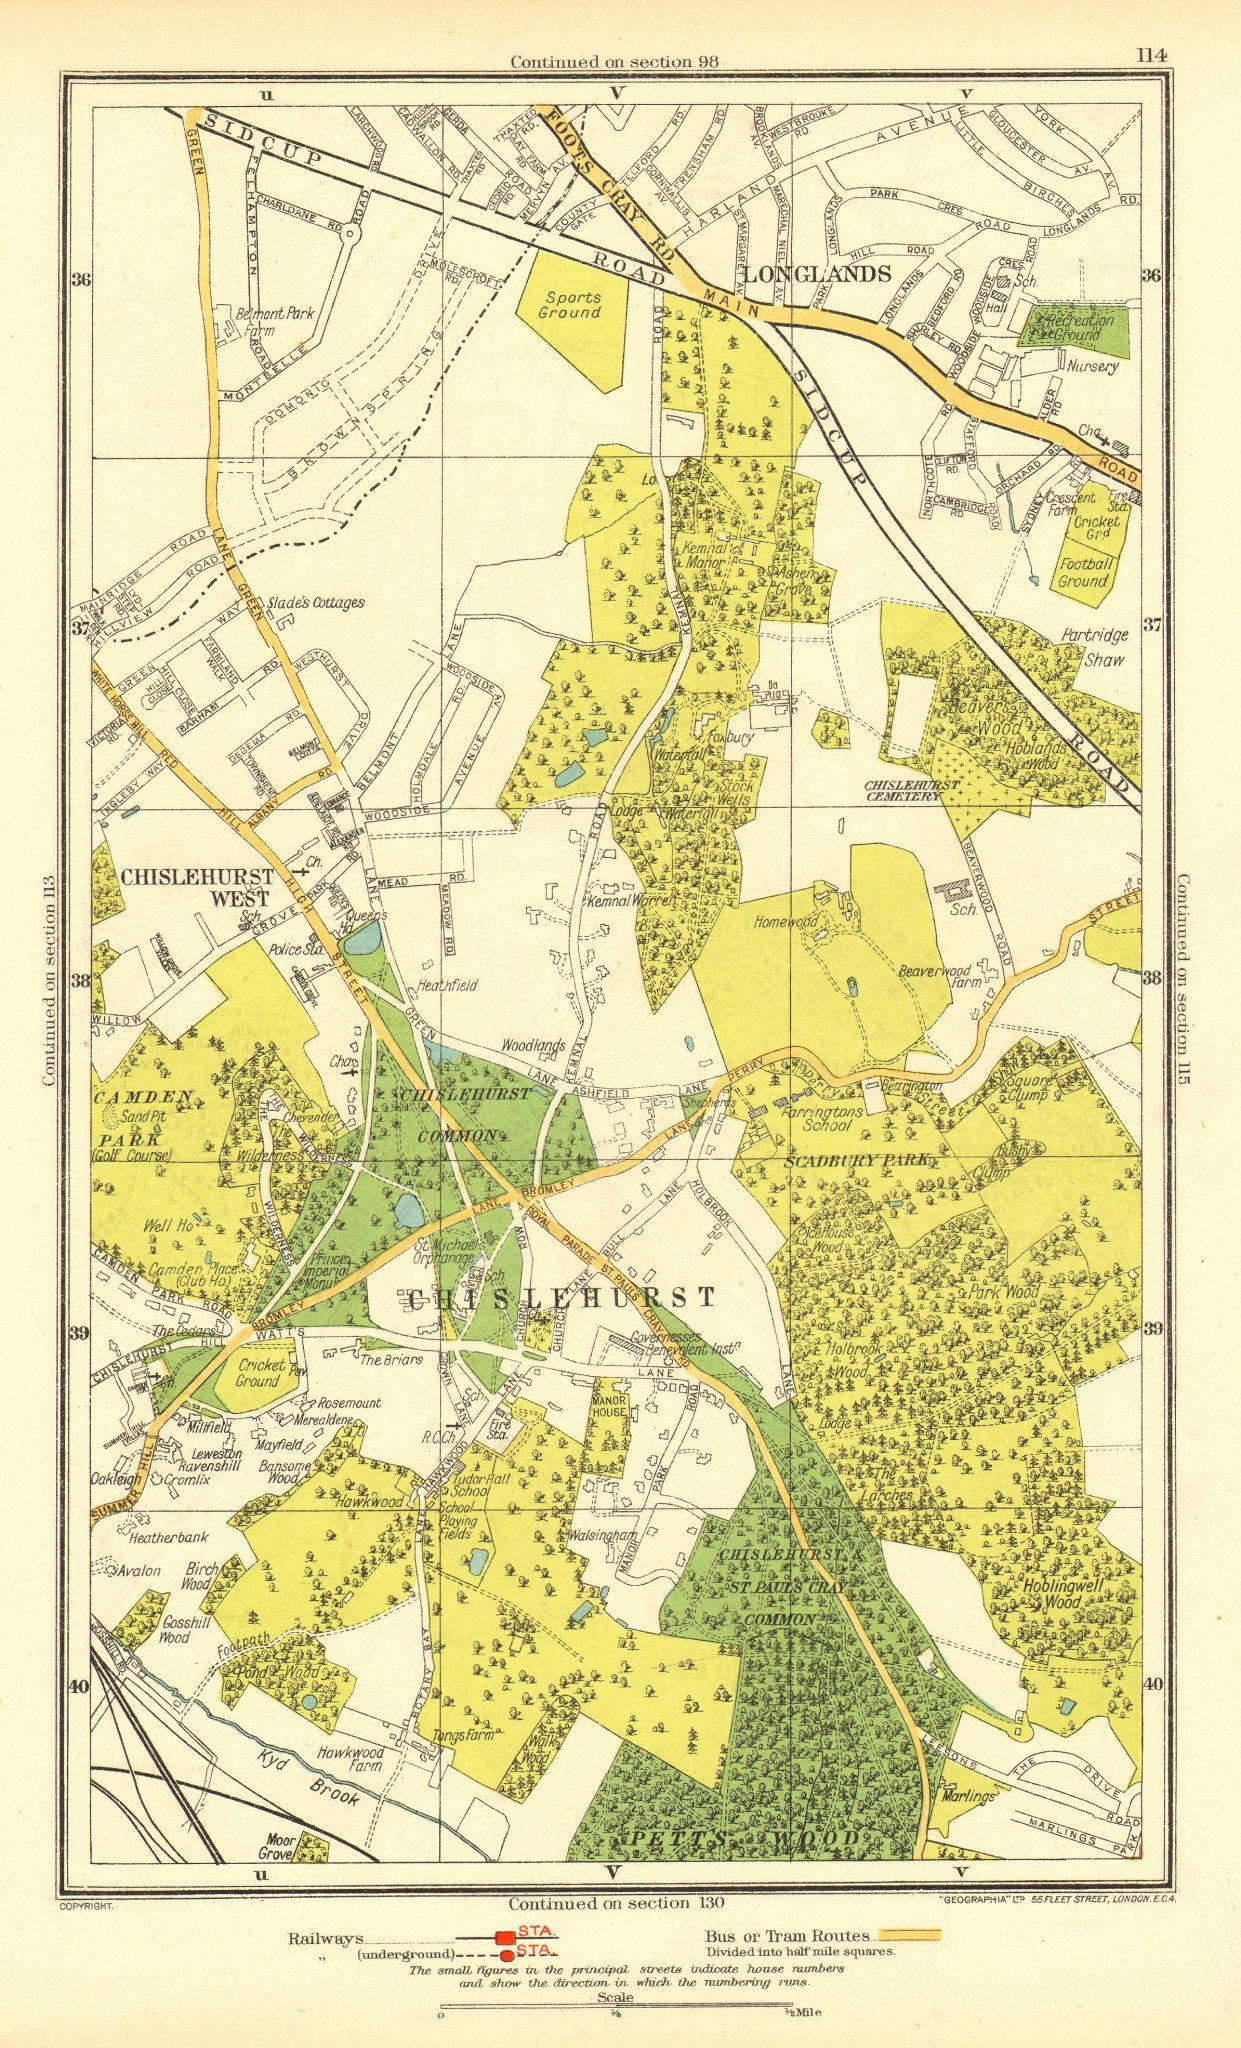 Associate Product CHISLEHURST. Chislehurst West Longlands Pett's Wood Sidcup Park Wood 1937 map